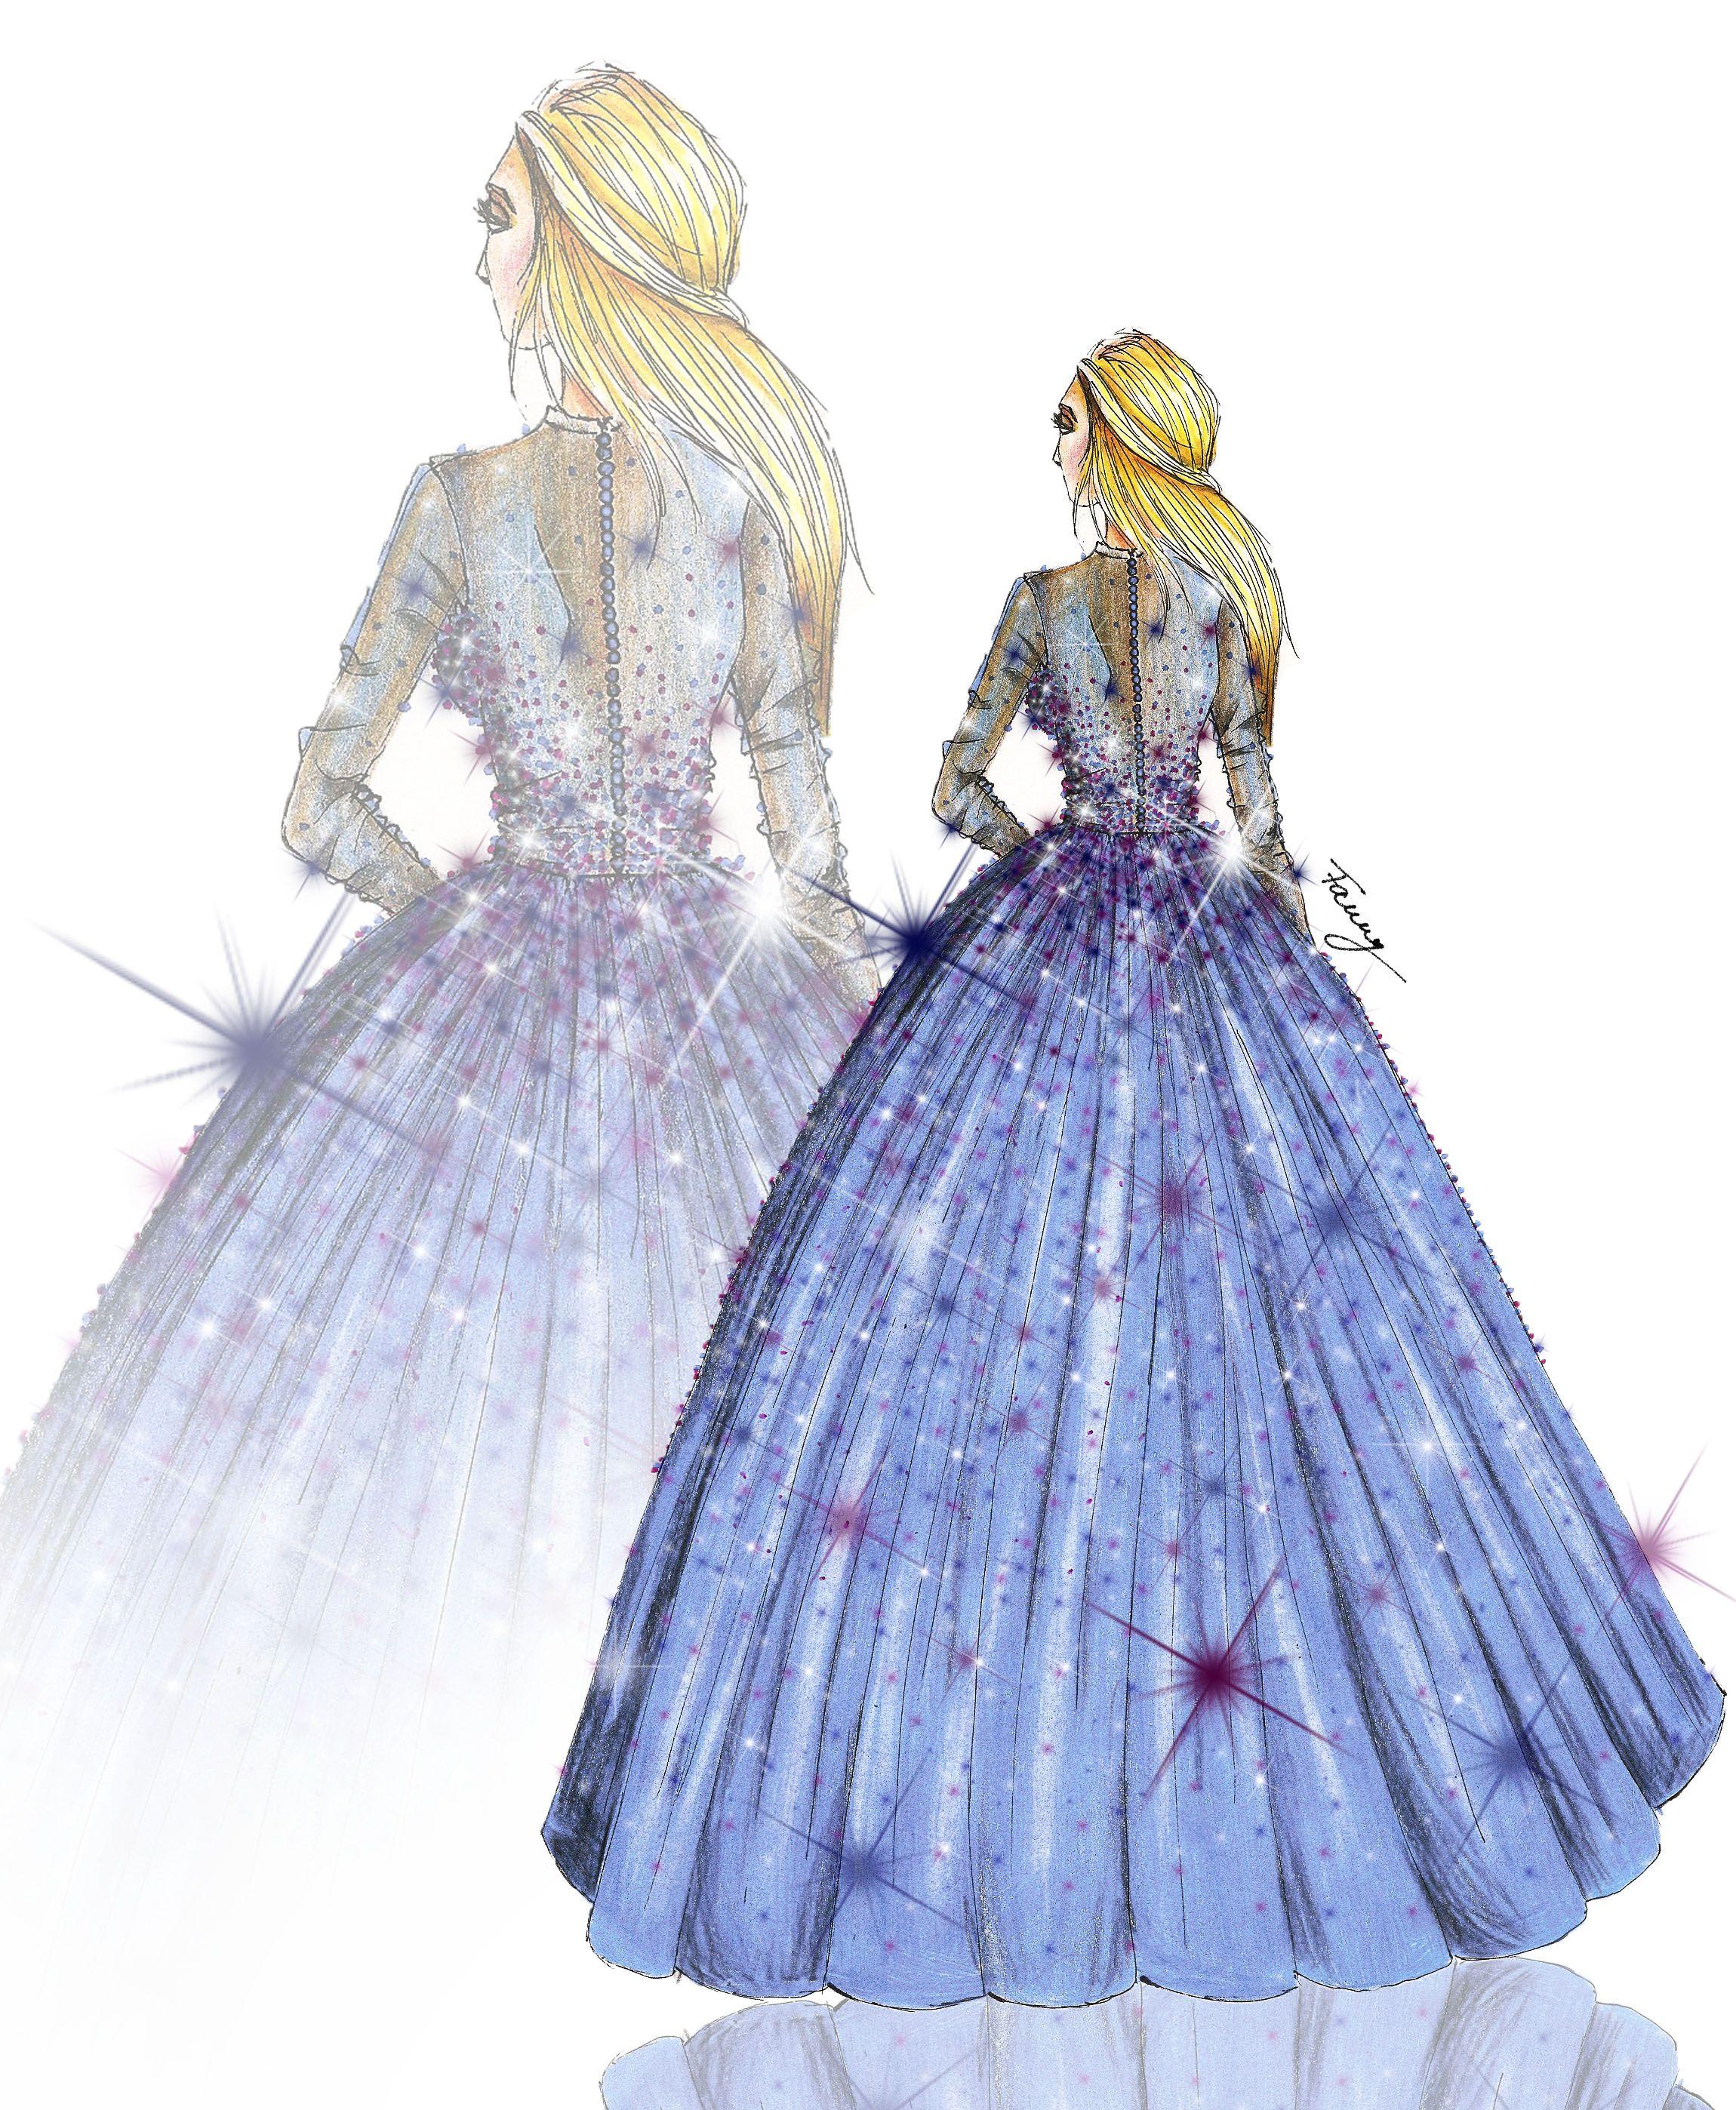 Haute couture collection part 3